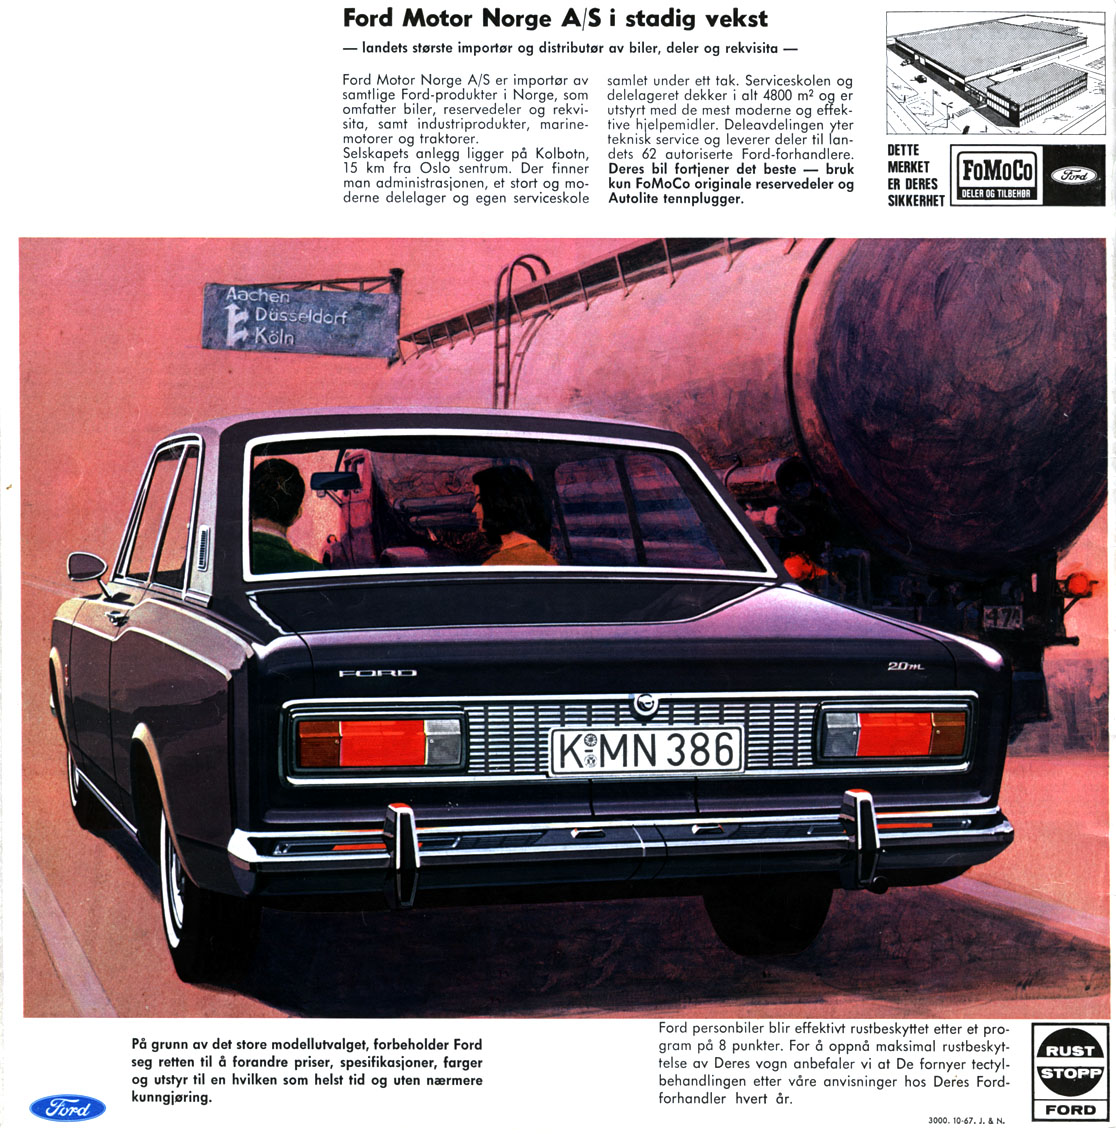 1968 German Ford Taunus 20M (on the road to Aachen near the exit Düsseldorf Köln) | pin by scann R | German classic cars | Pinterest | Ford Cars and Car ... & 1968 German Ford Taunus 20M (on the road to Aachen near the exit ... markmcfarlin.com